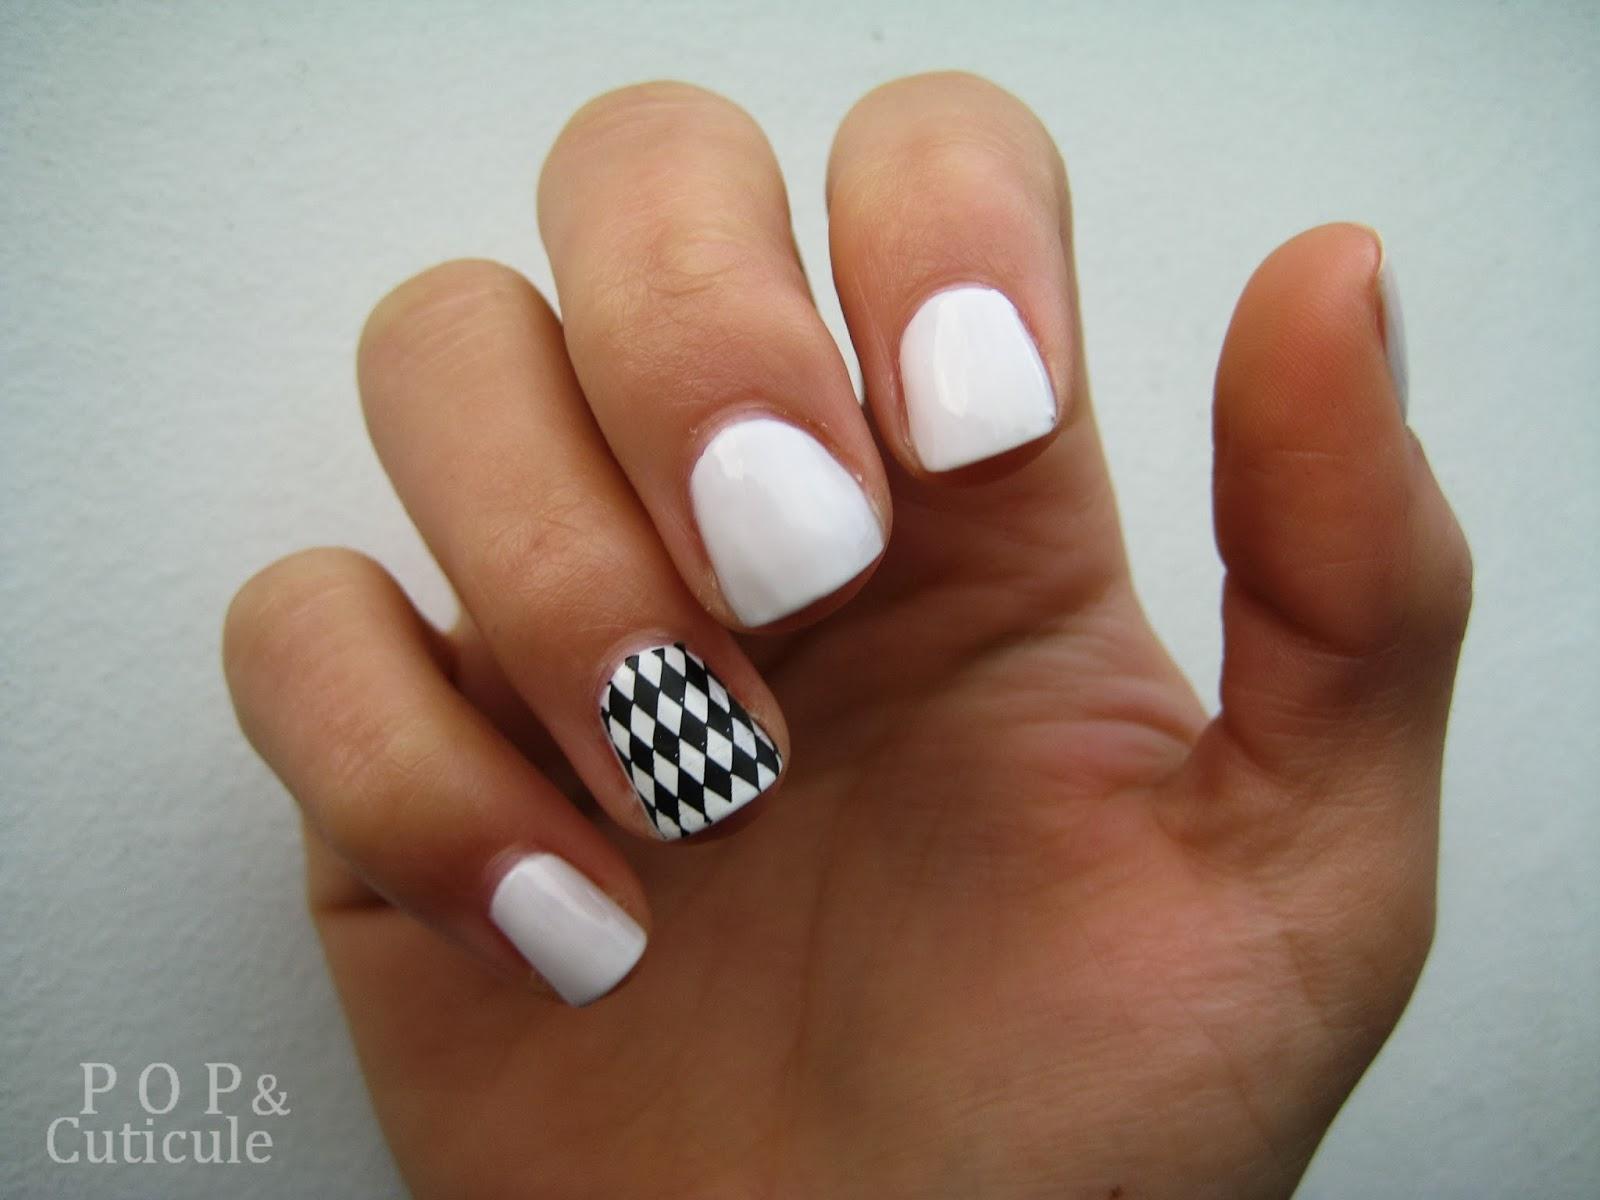 Pop & Cuticule, Bright White Picture Polish